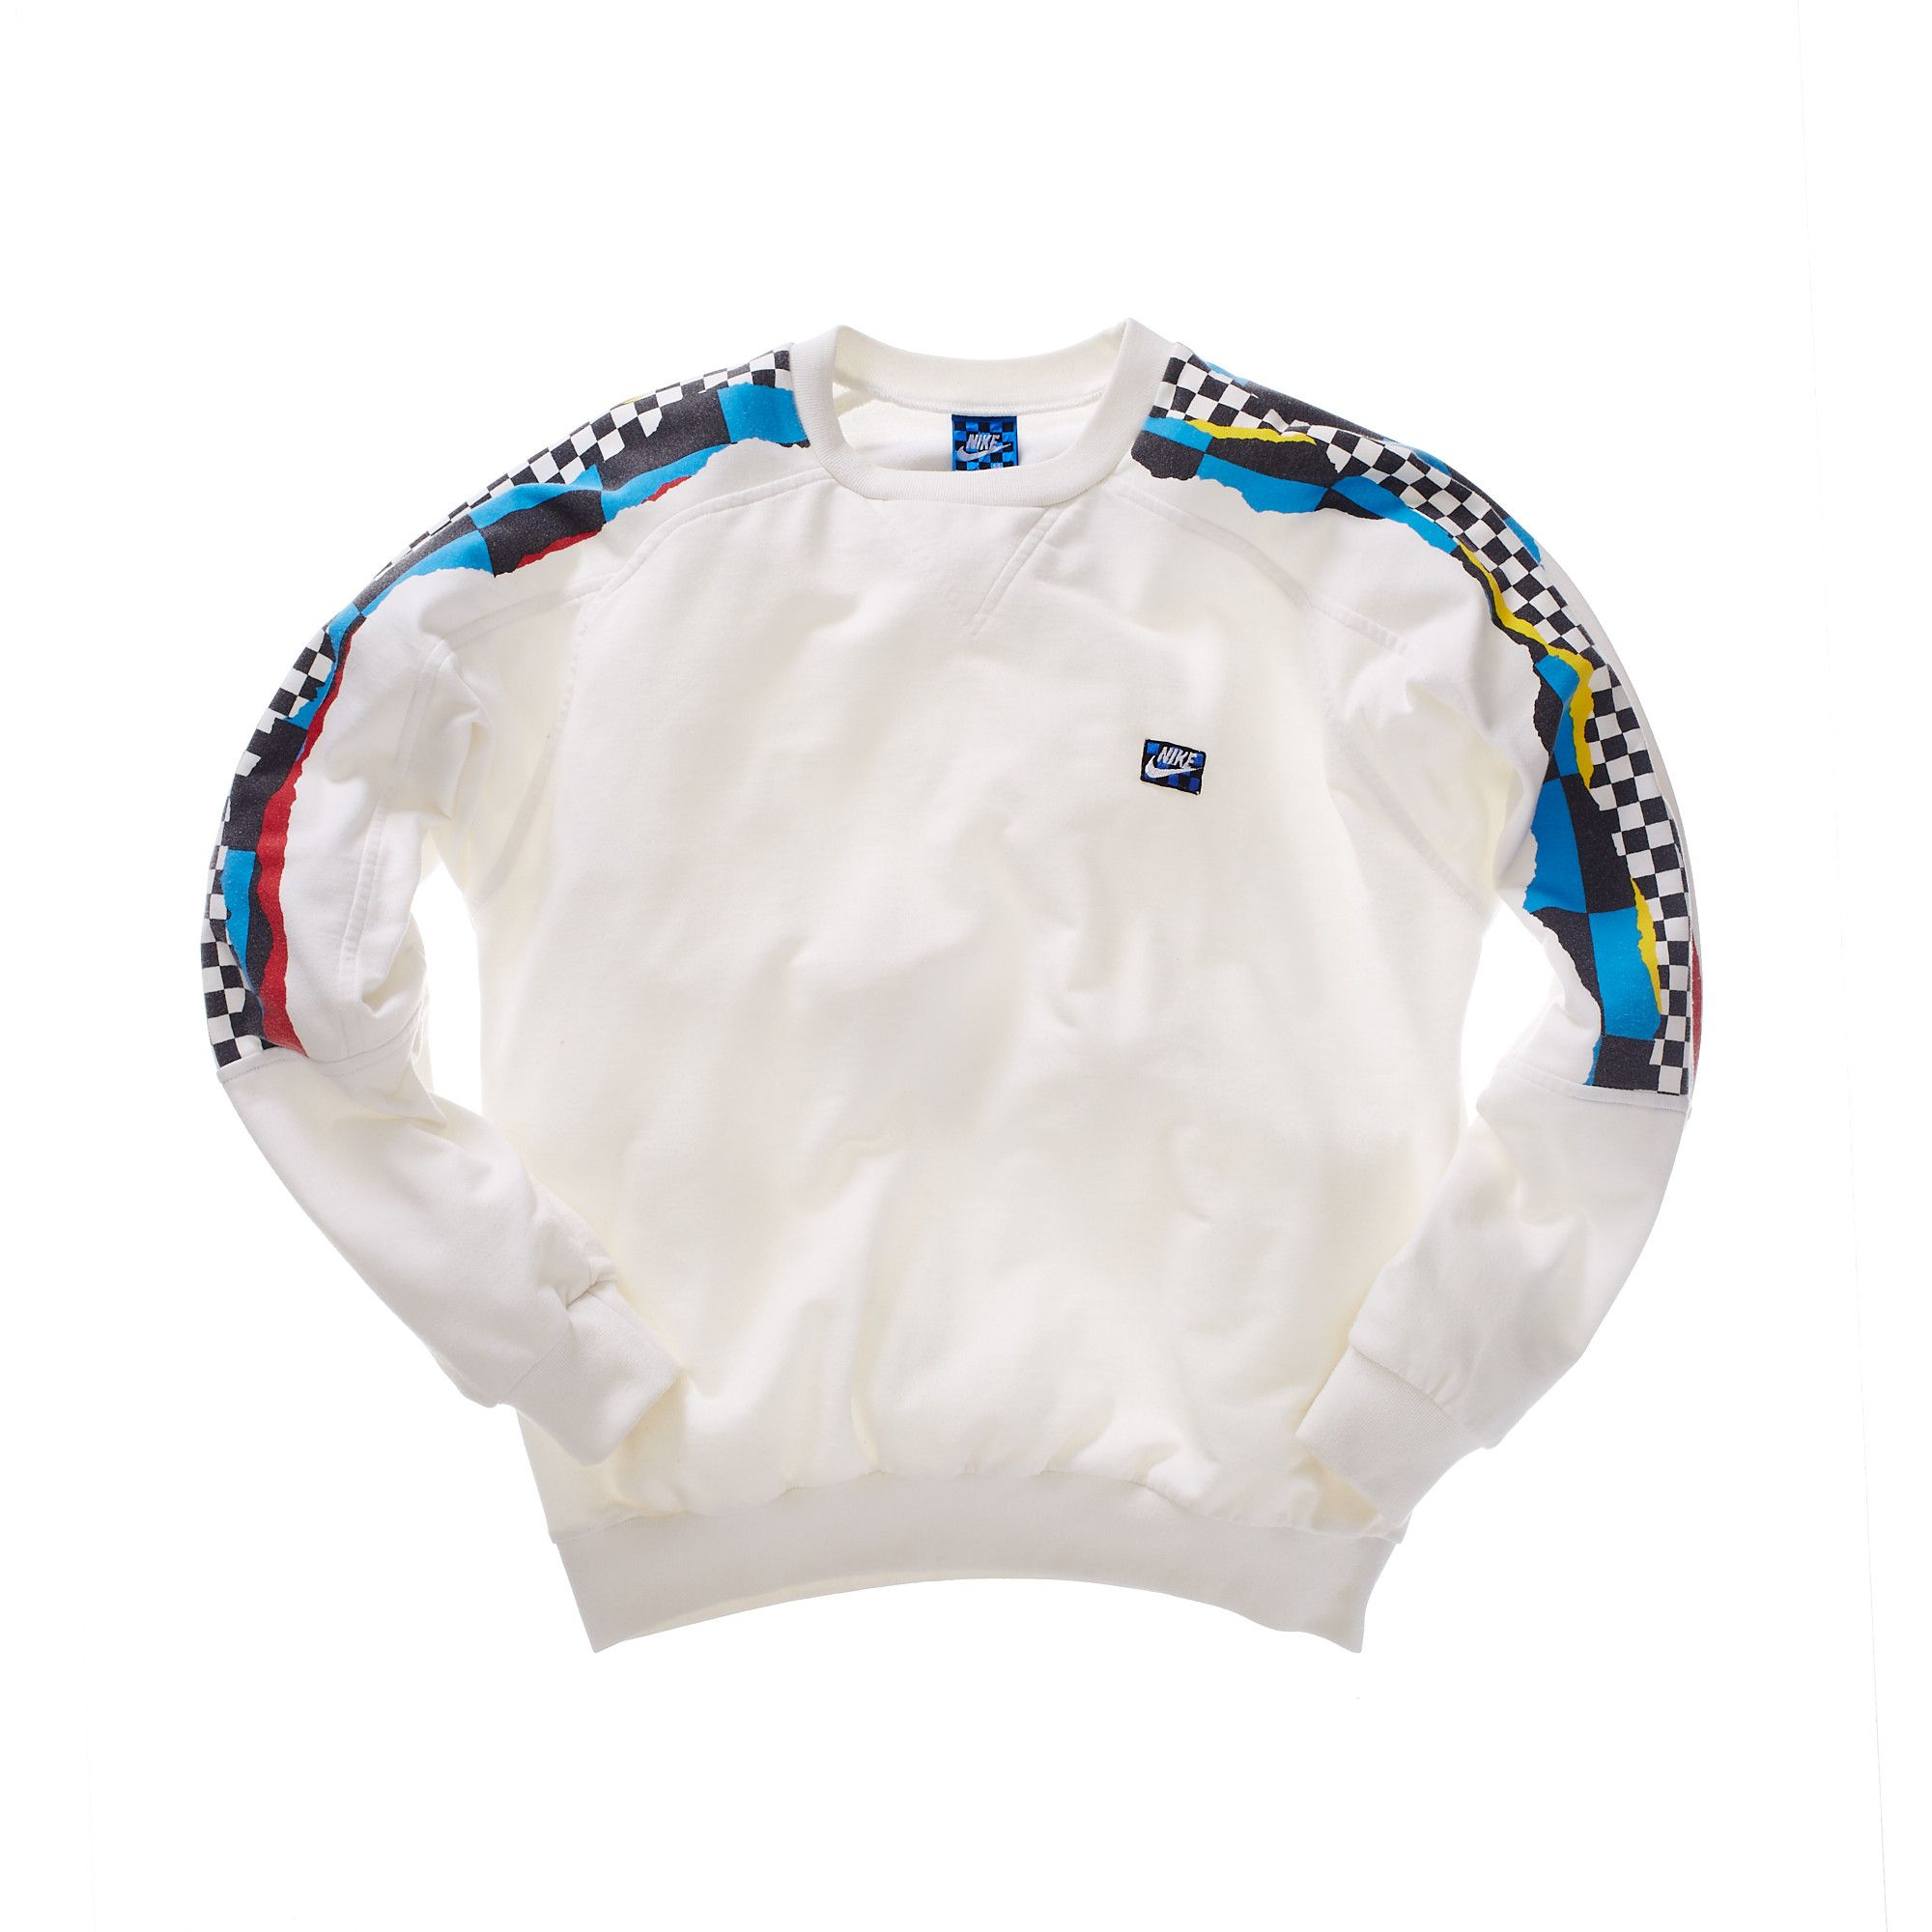 Nike Mcenroe Sweatshirt With Checkered Arm Stripes 1990s How To Wear Sweatshirts Fashion [ 2000 x 2000 Pixel ]